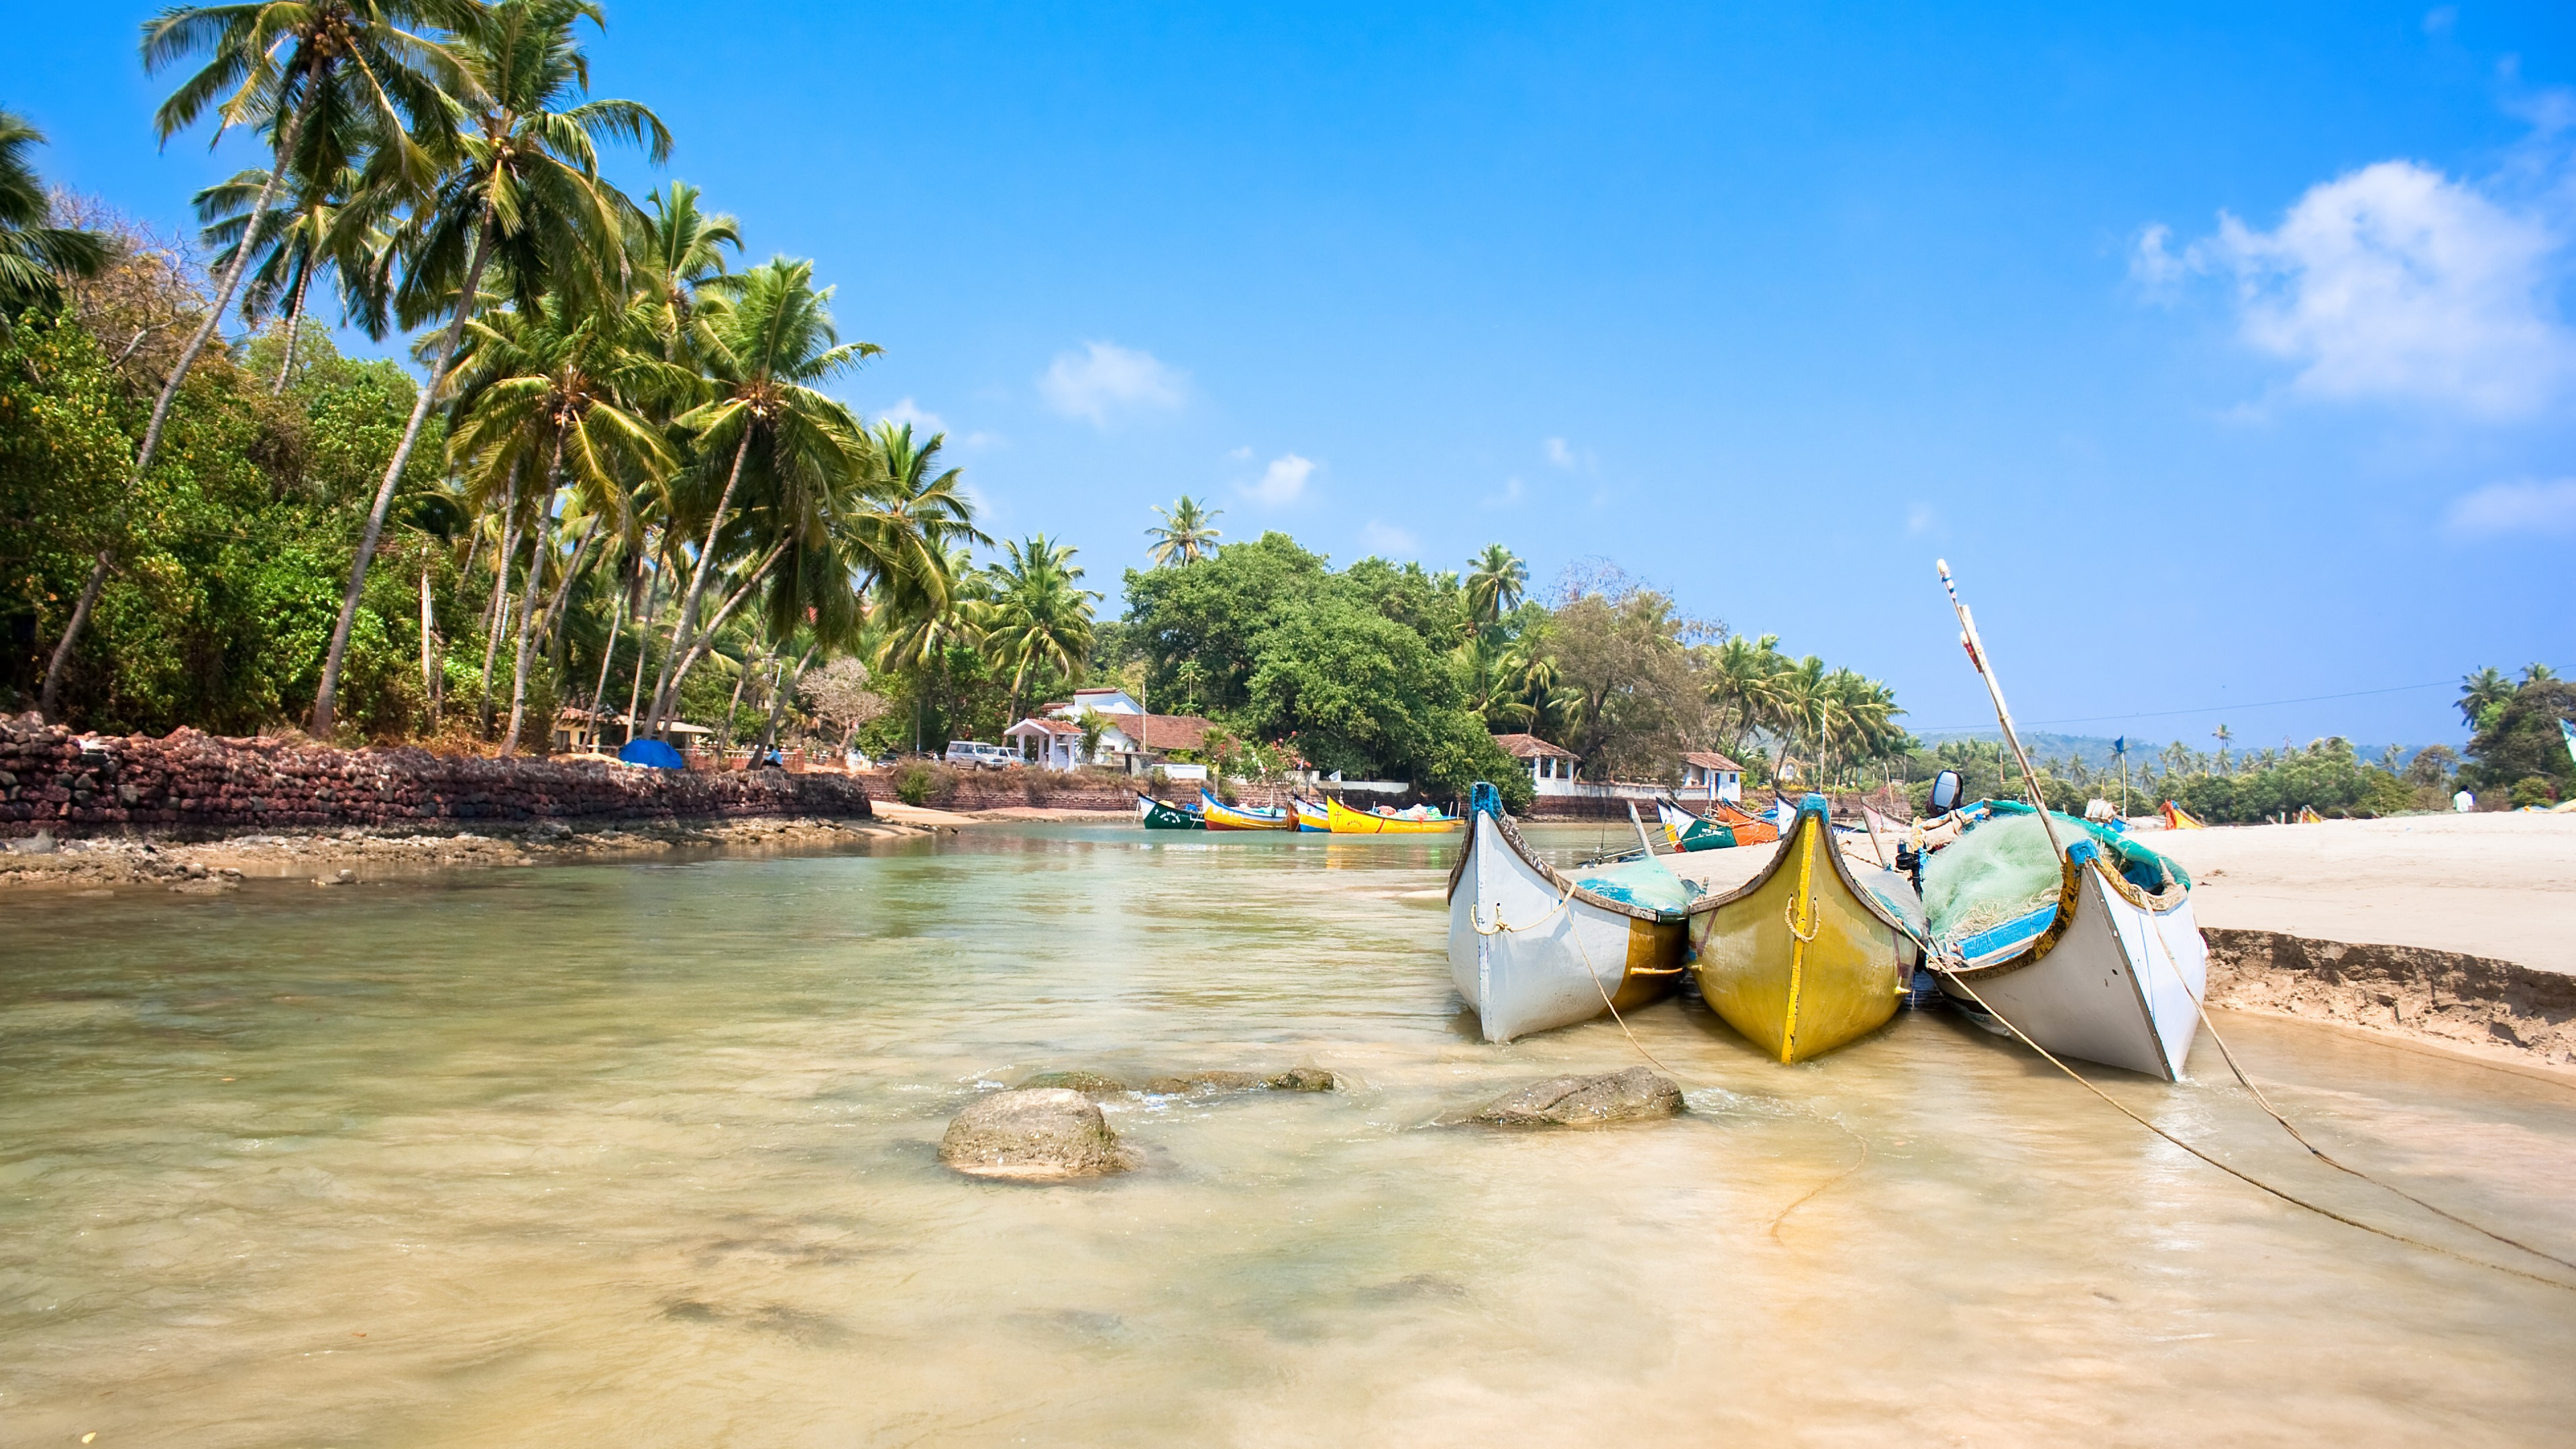 Wallpaper Goa 5k 4k wallpaper India Indian ocean palms boats 3840x2160